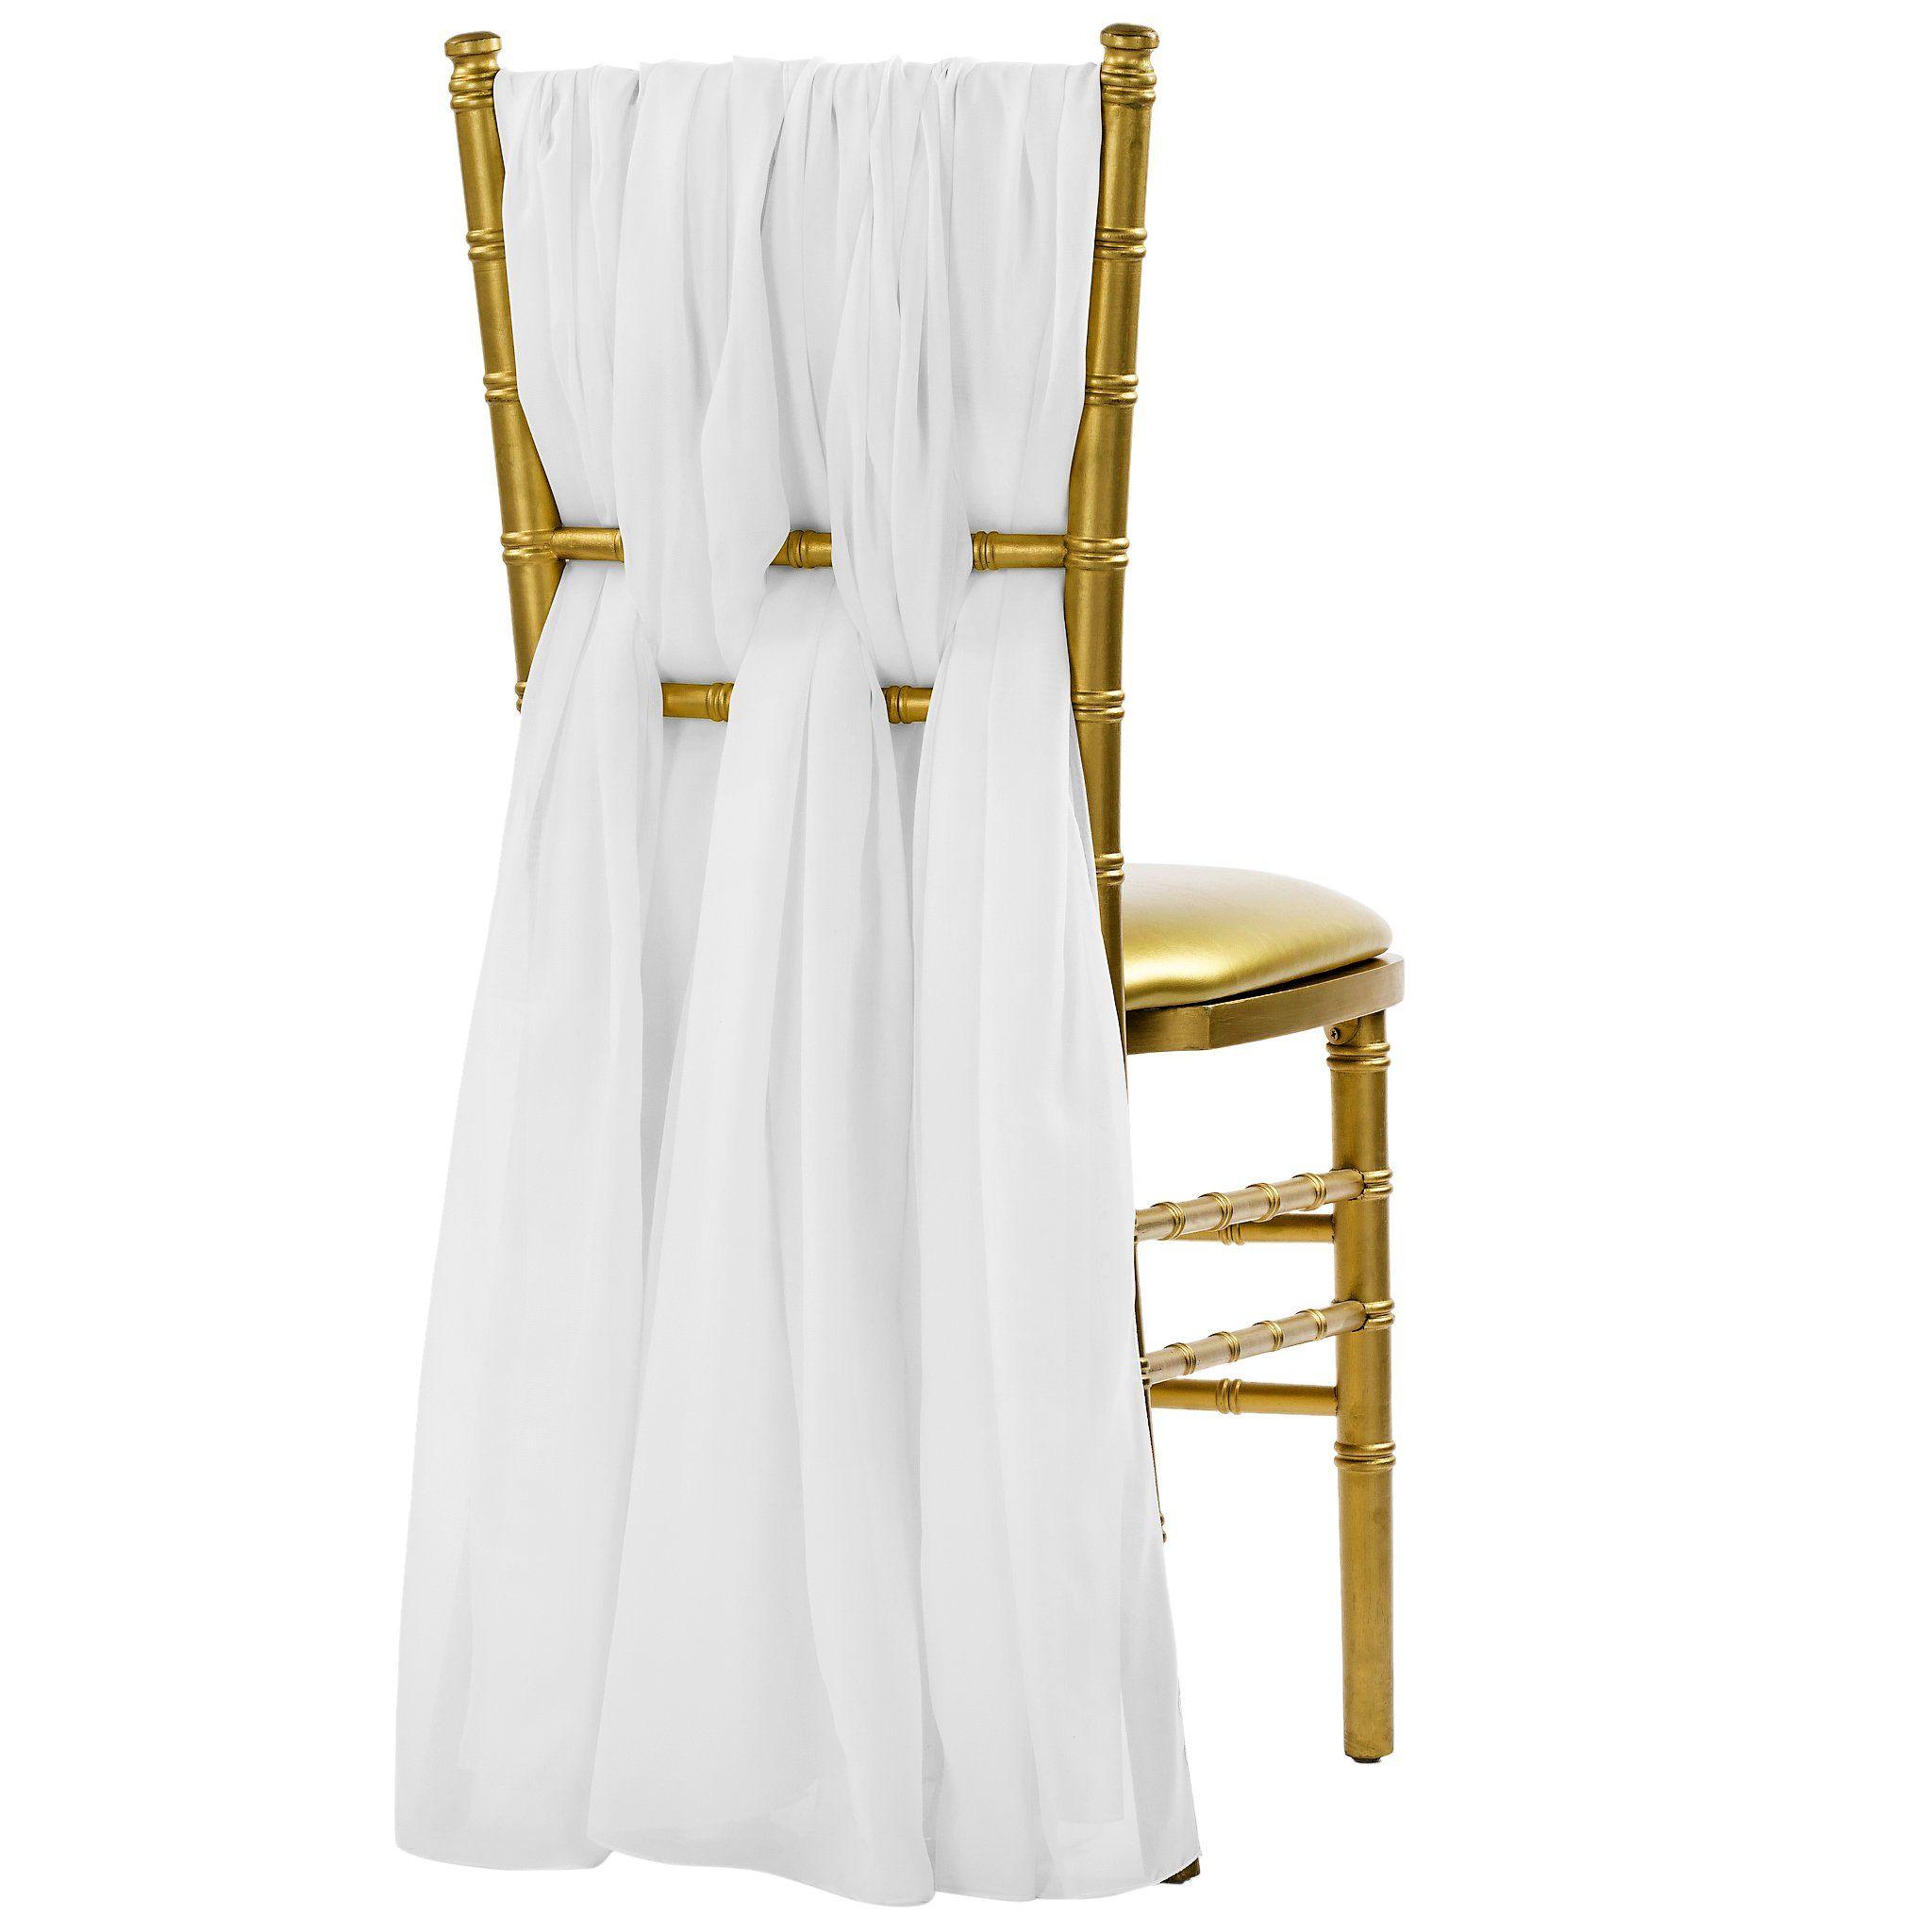 5pcs Pack of Chiffon Chair Sashes/Ties - White